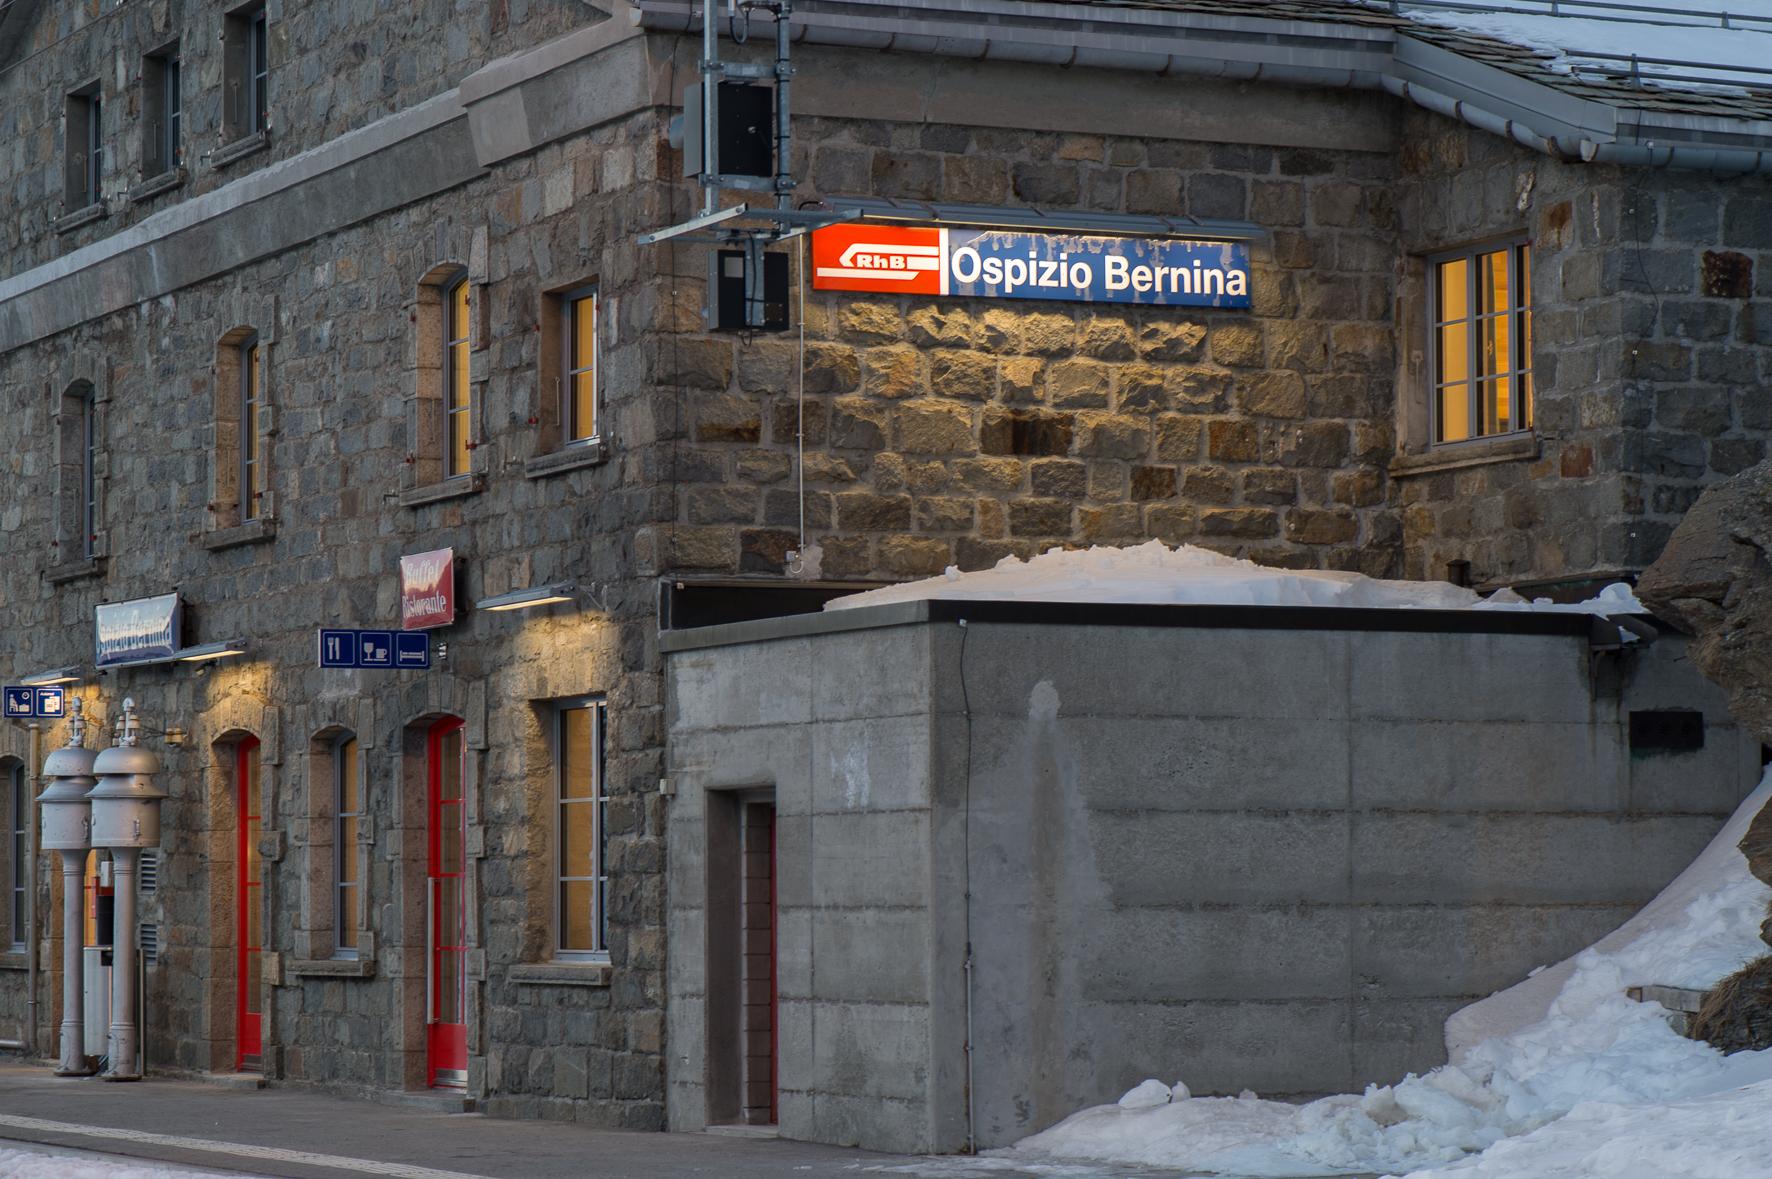 Bahnhofbuffet Ospizio Bernina Slide 1